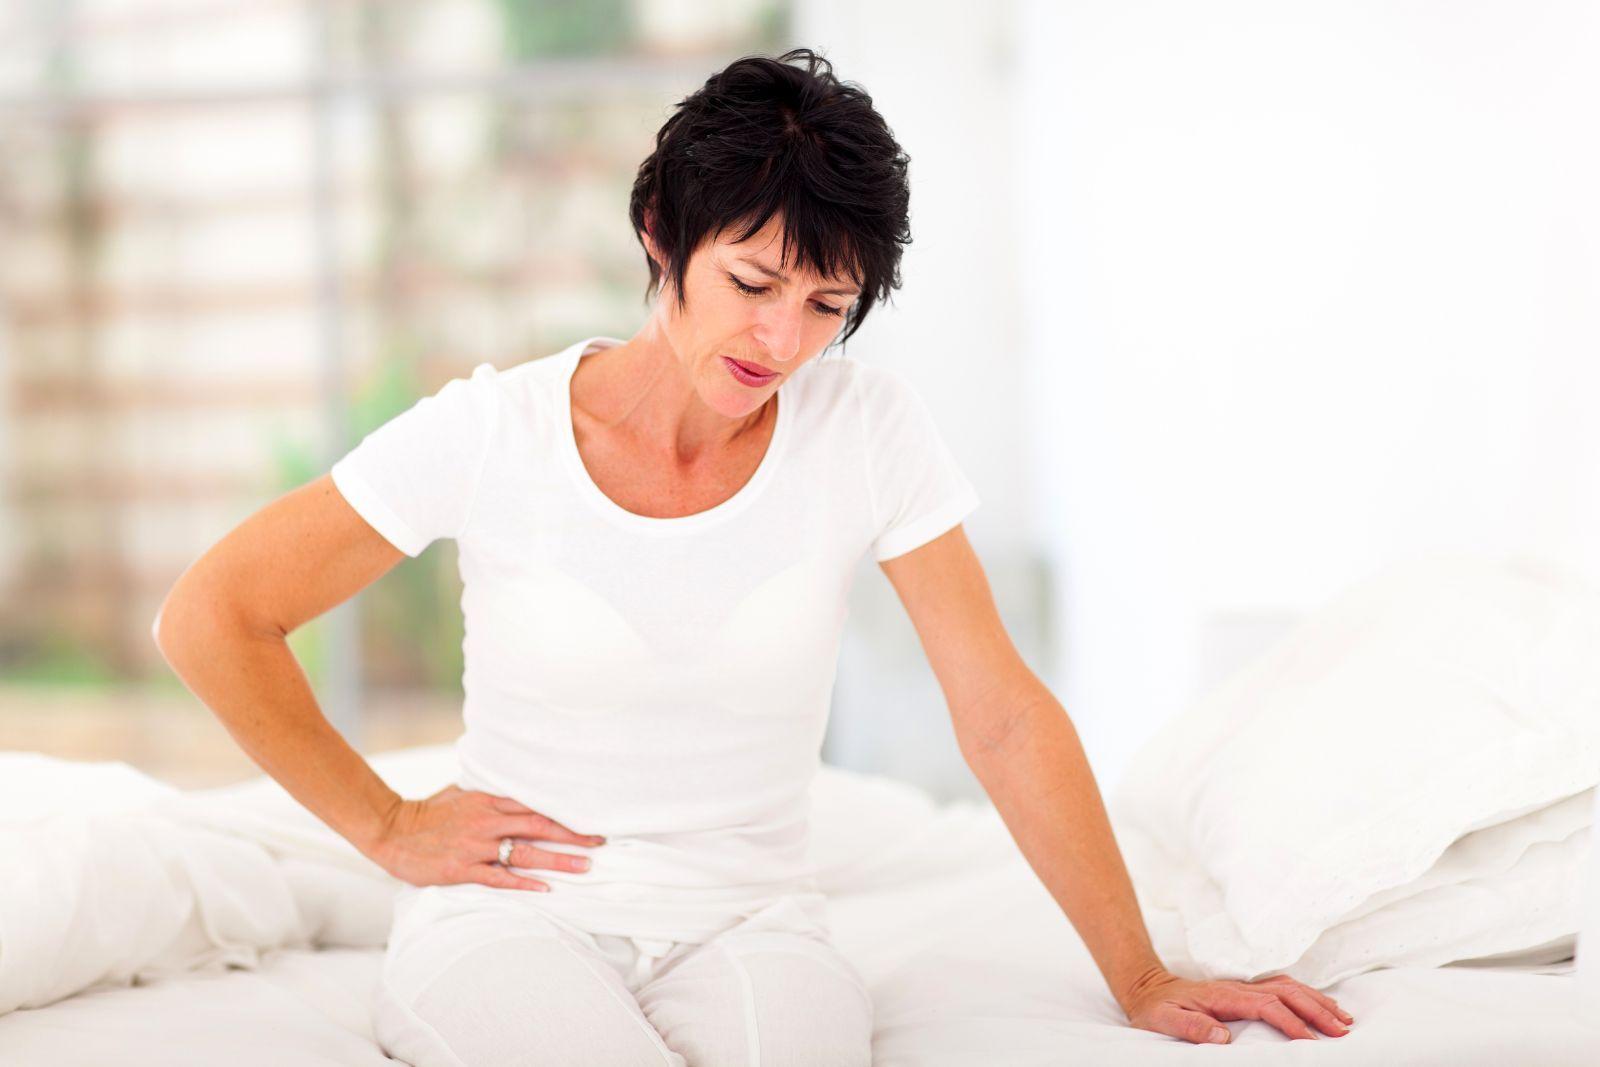 Hemorragia uterina